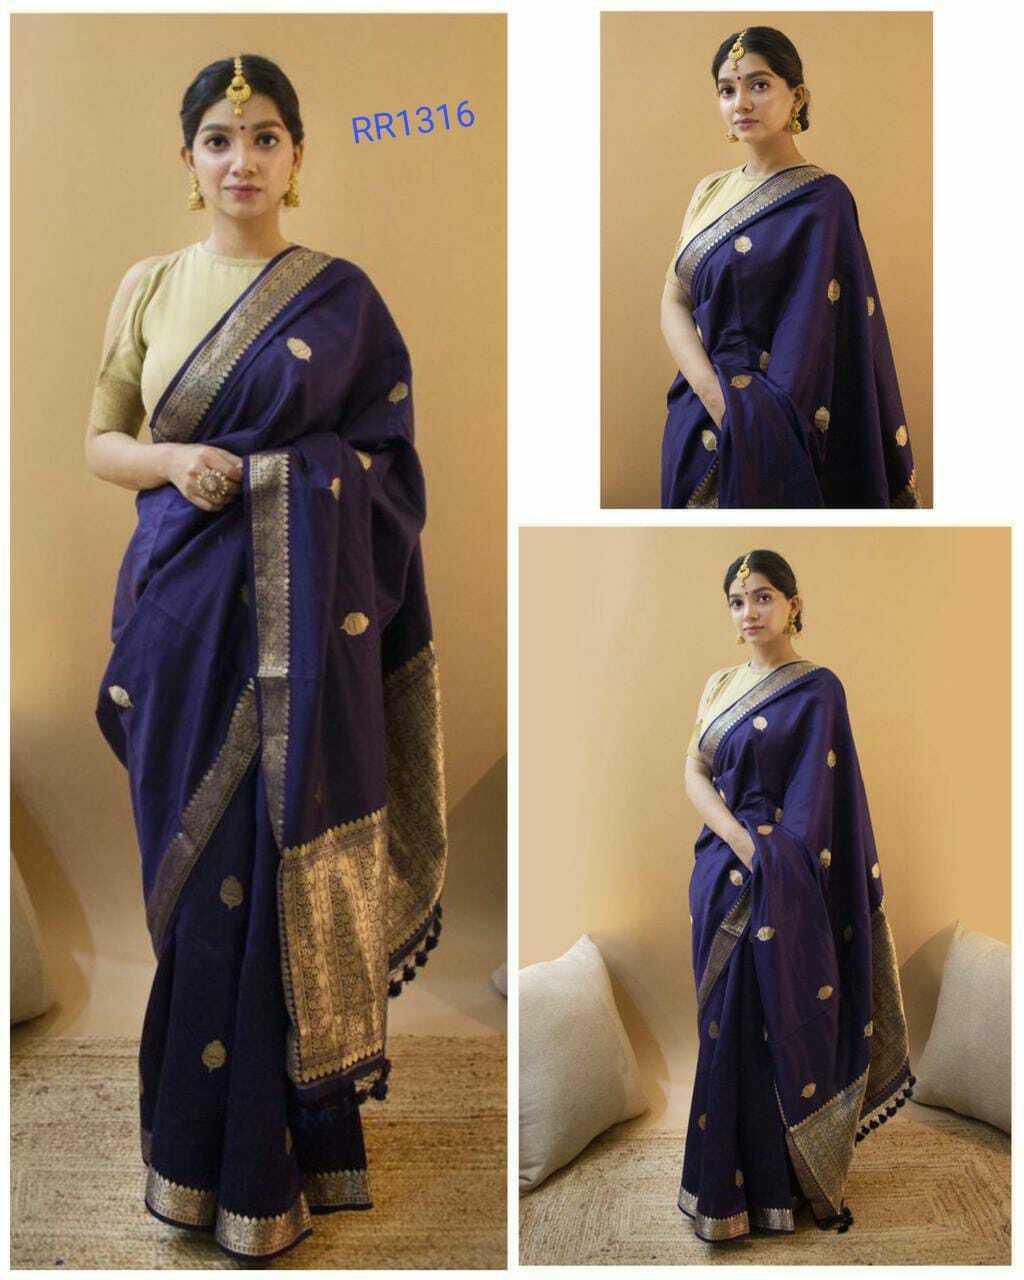 Kanchipuram silk saree Indian wedding formal heavy rich pallu with blouse